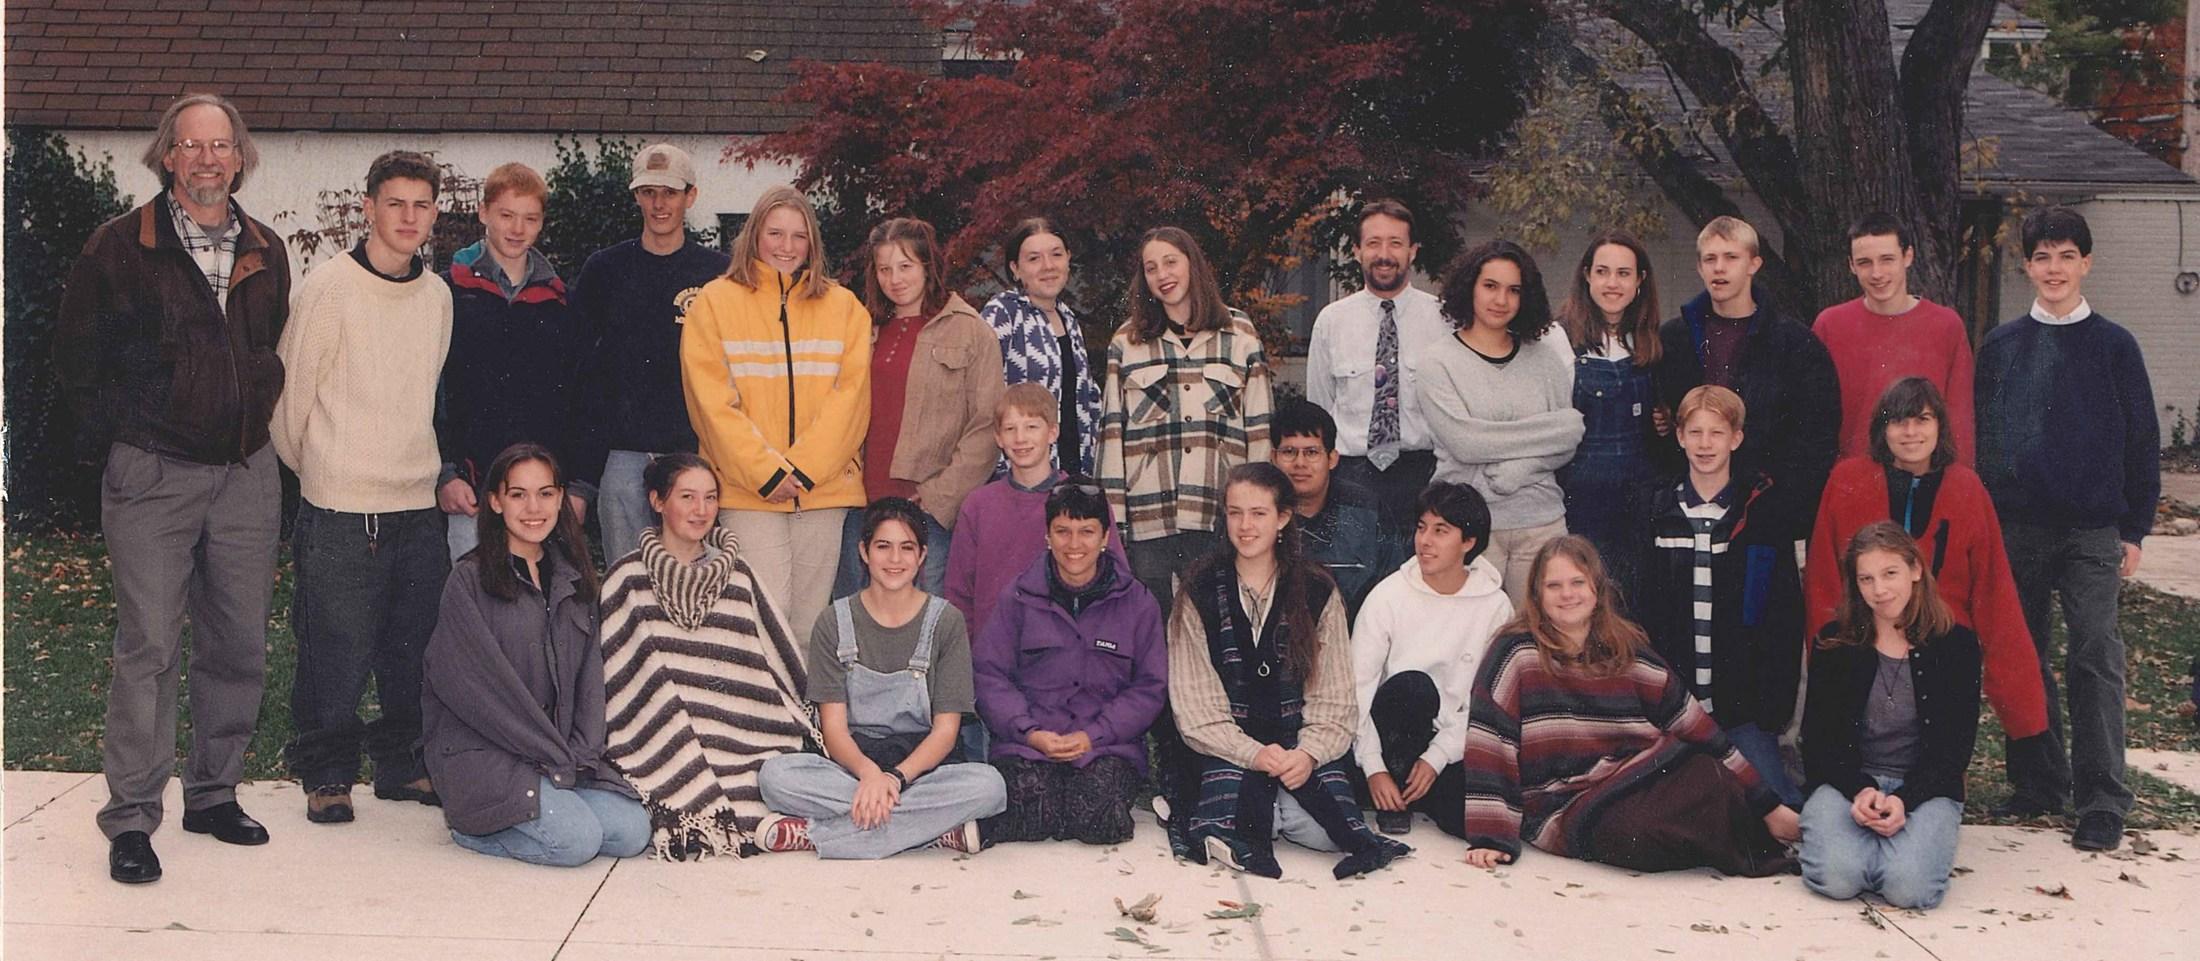 1998 Class